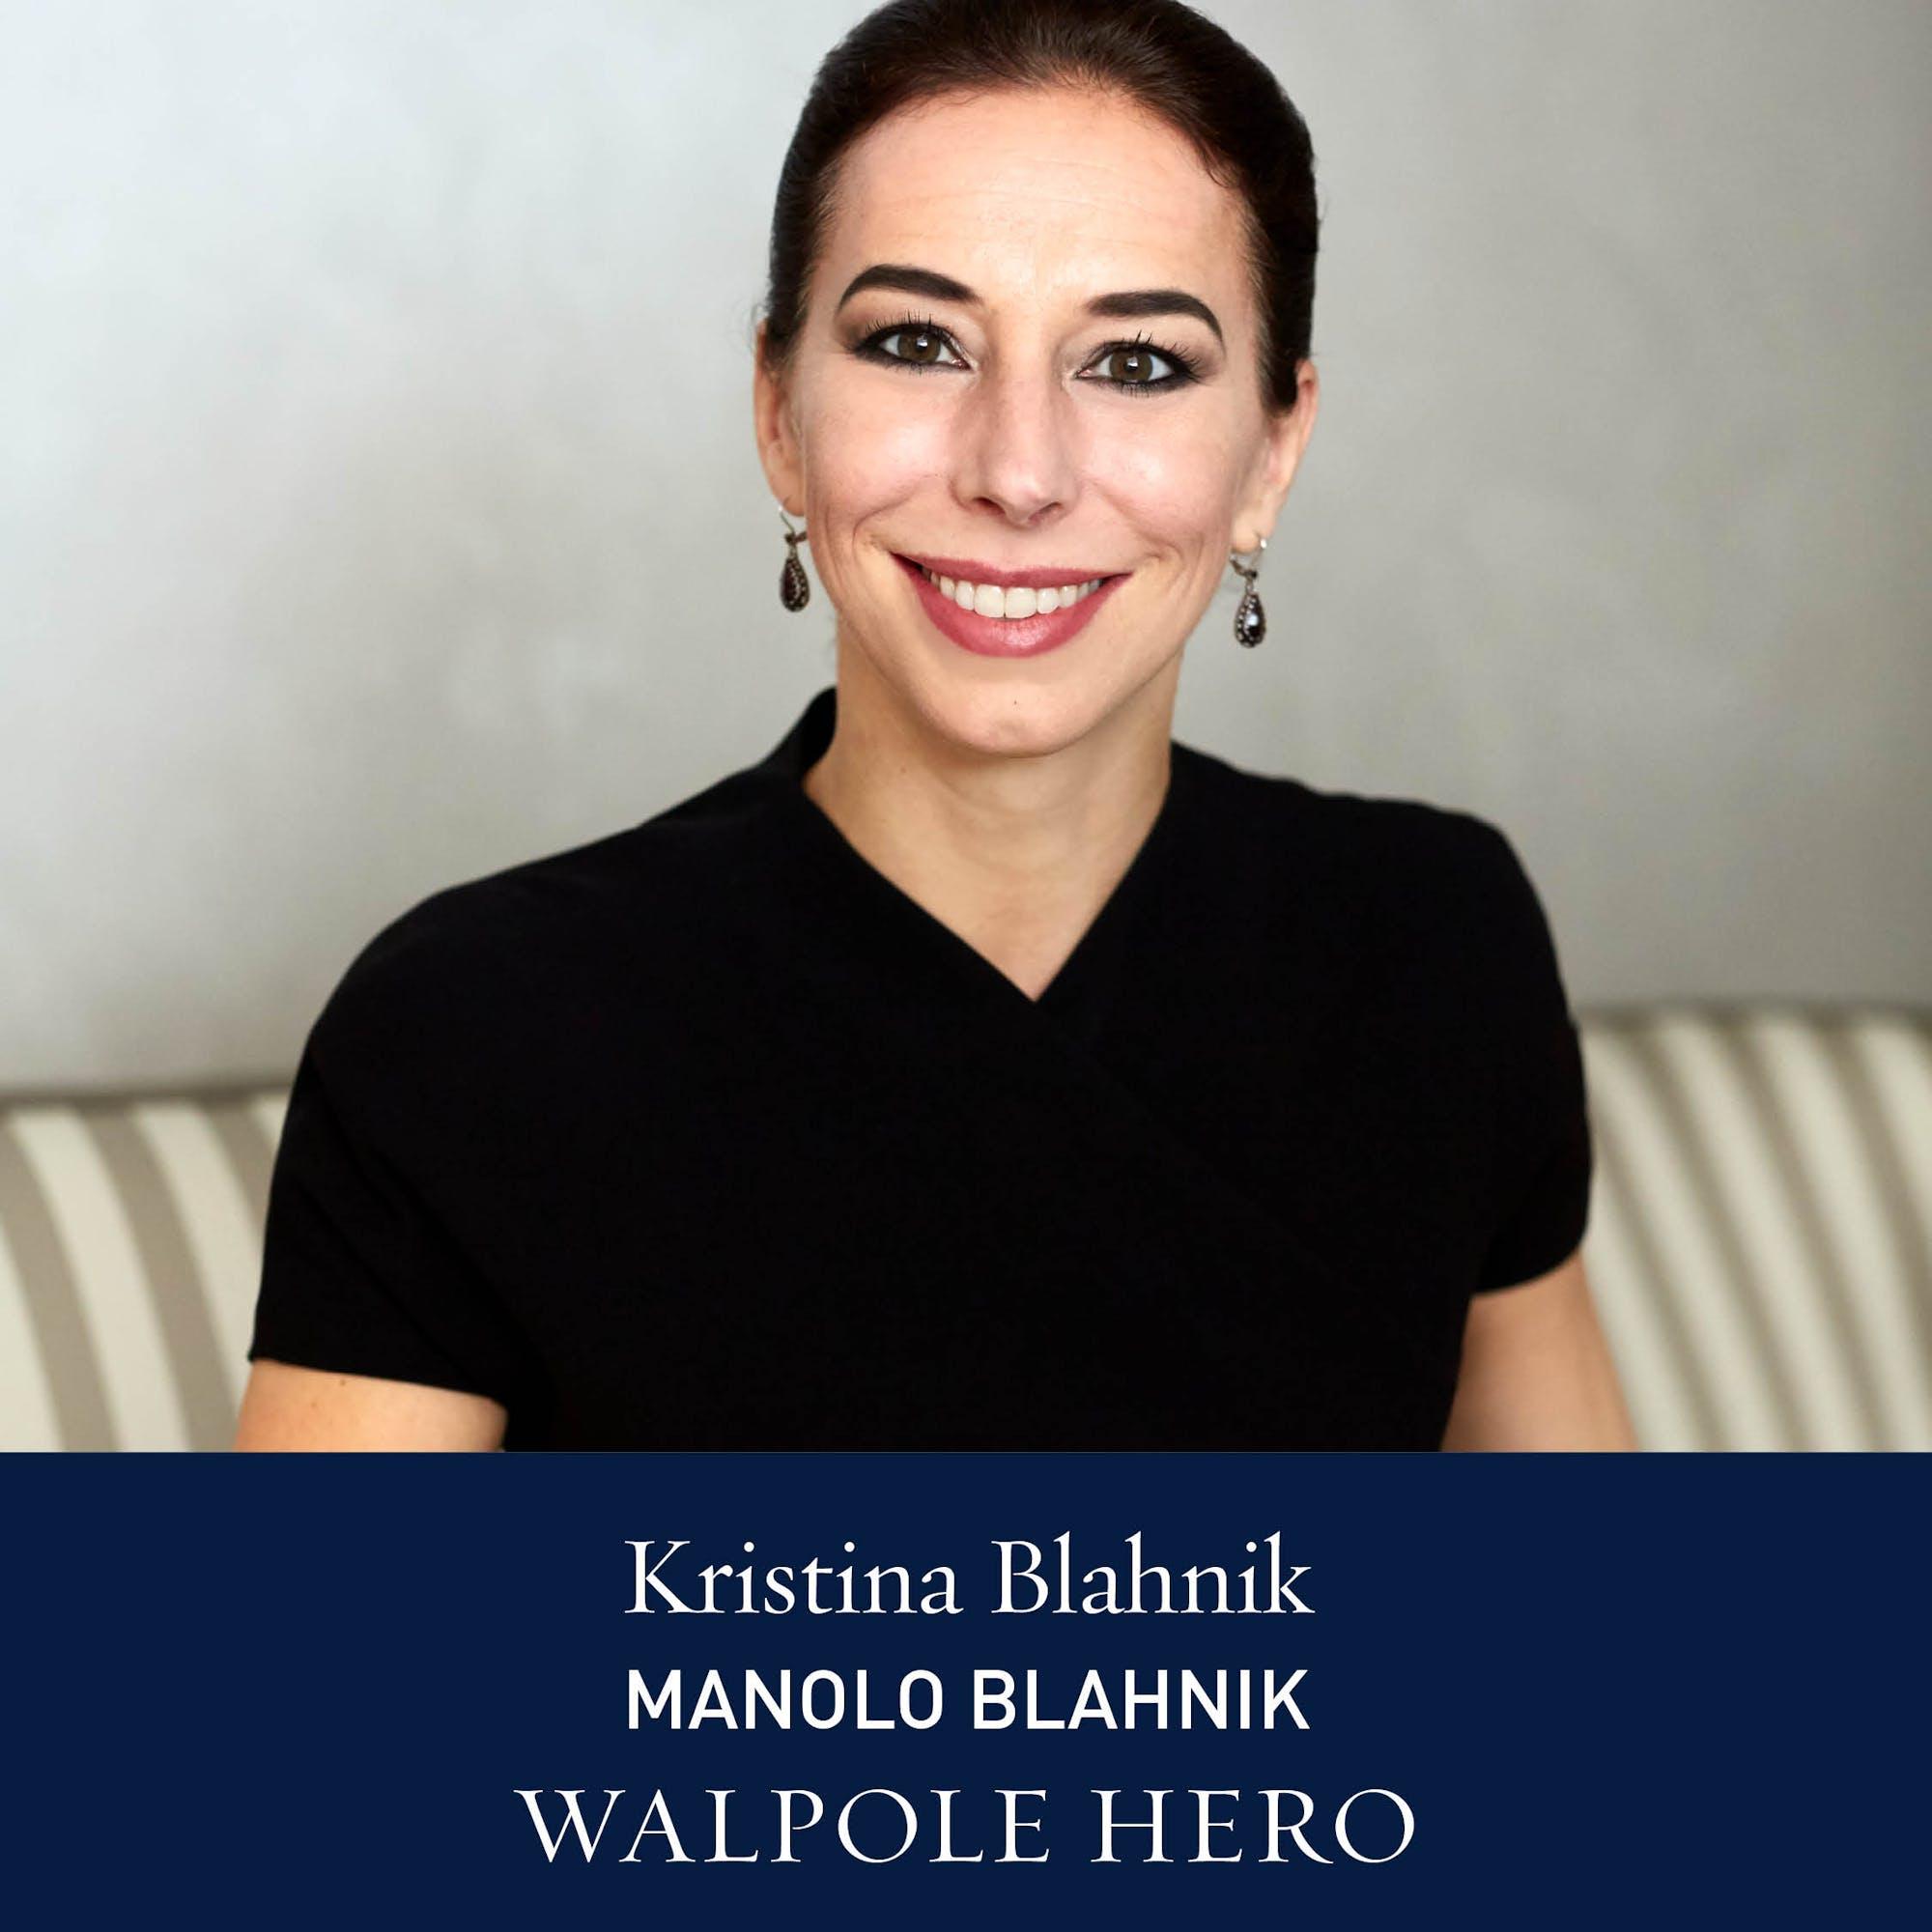 The Walpole Power List  The Heroes: Kristina Blahnik, CEO, Manolo Blahnik